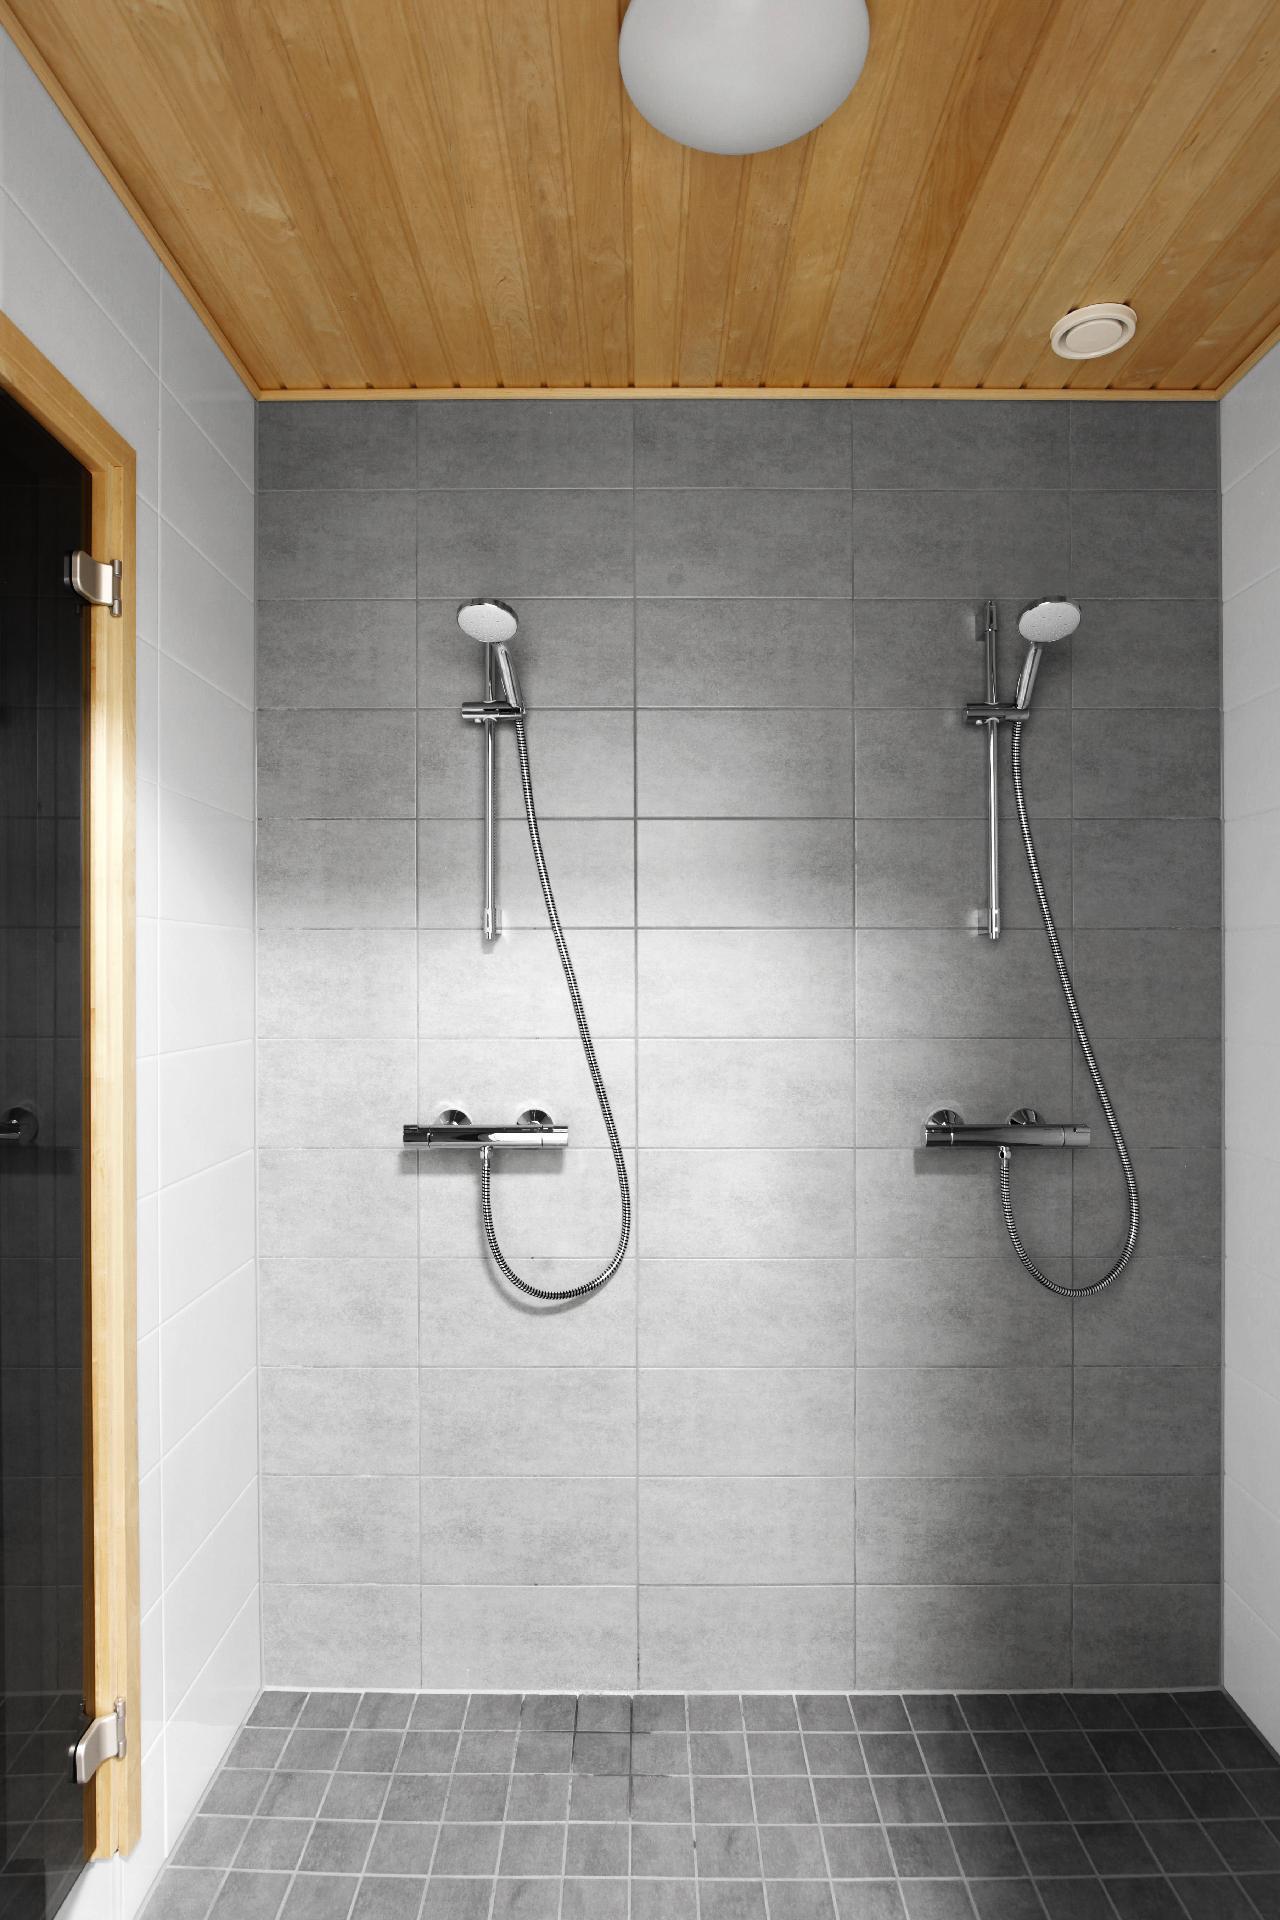 Pesuhuonessa kaksi suihkua